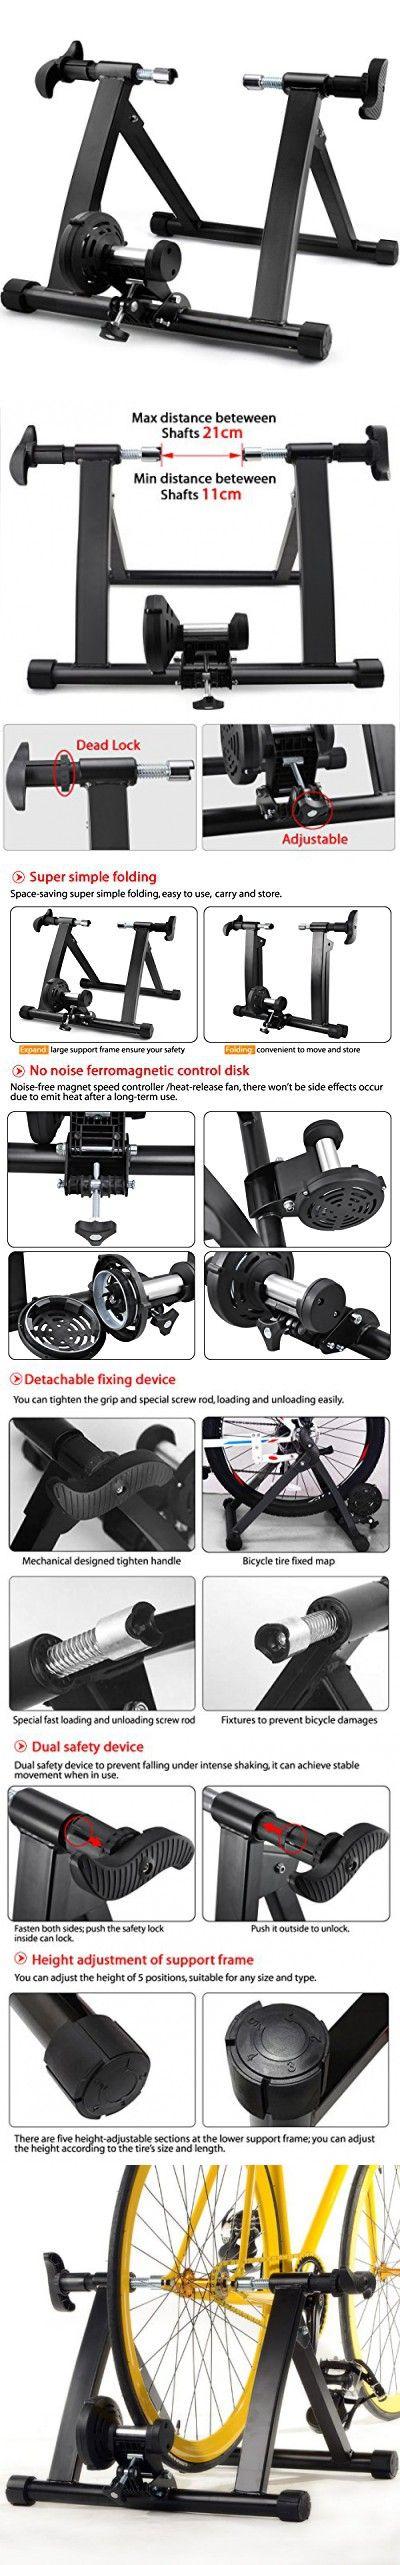 Gotobuy Magnet Steel Bike/bicycle Indoor Exercise Trainer Stand